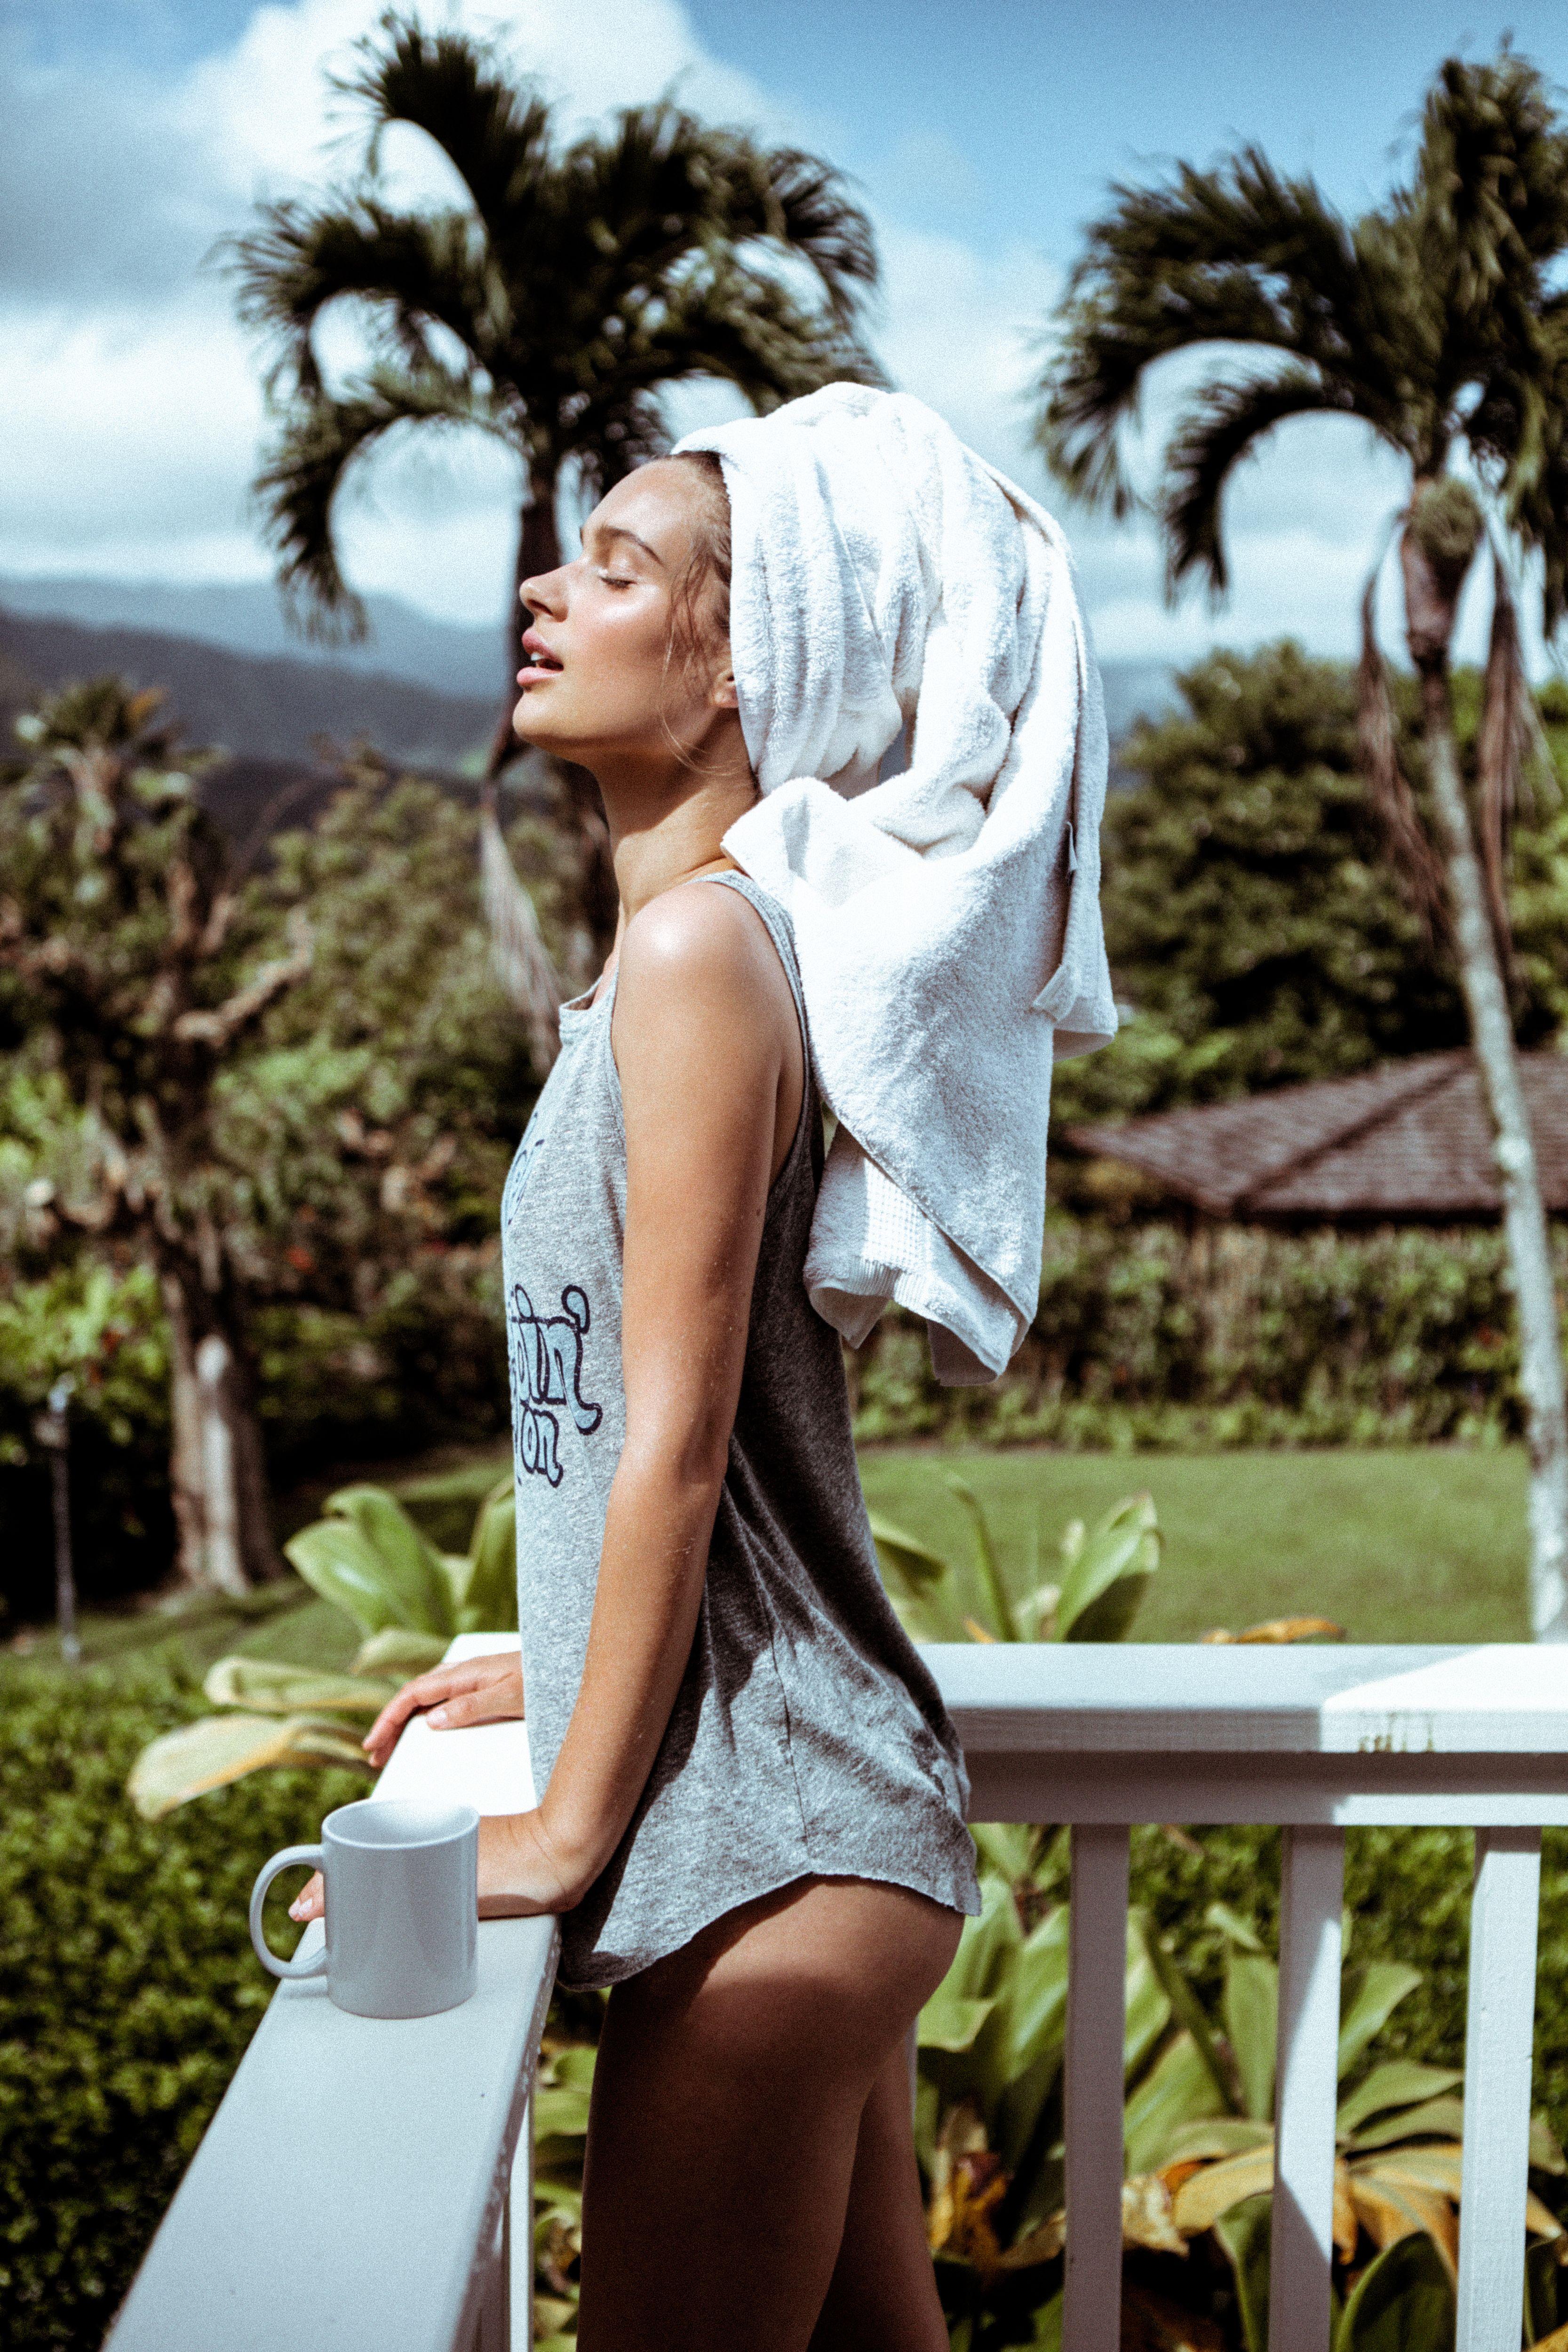 LOST IN PARADISE // Lise Bjørgen Olsen for MATE the Label summer '16 shot by Bryan Rodner Carr